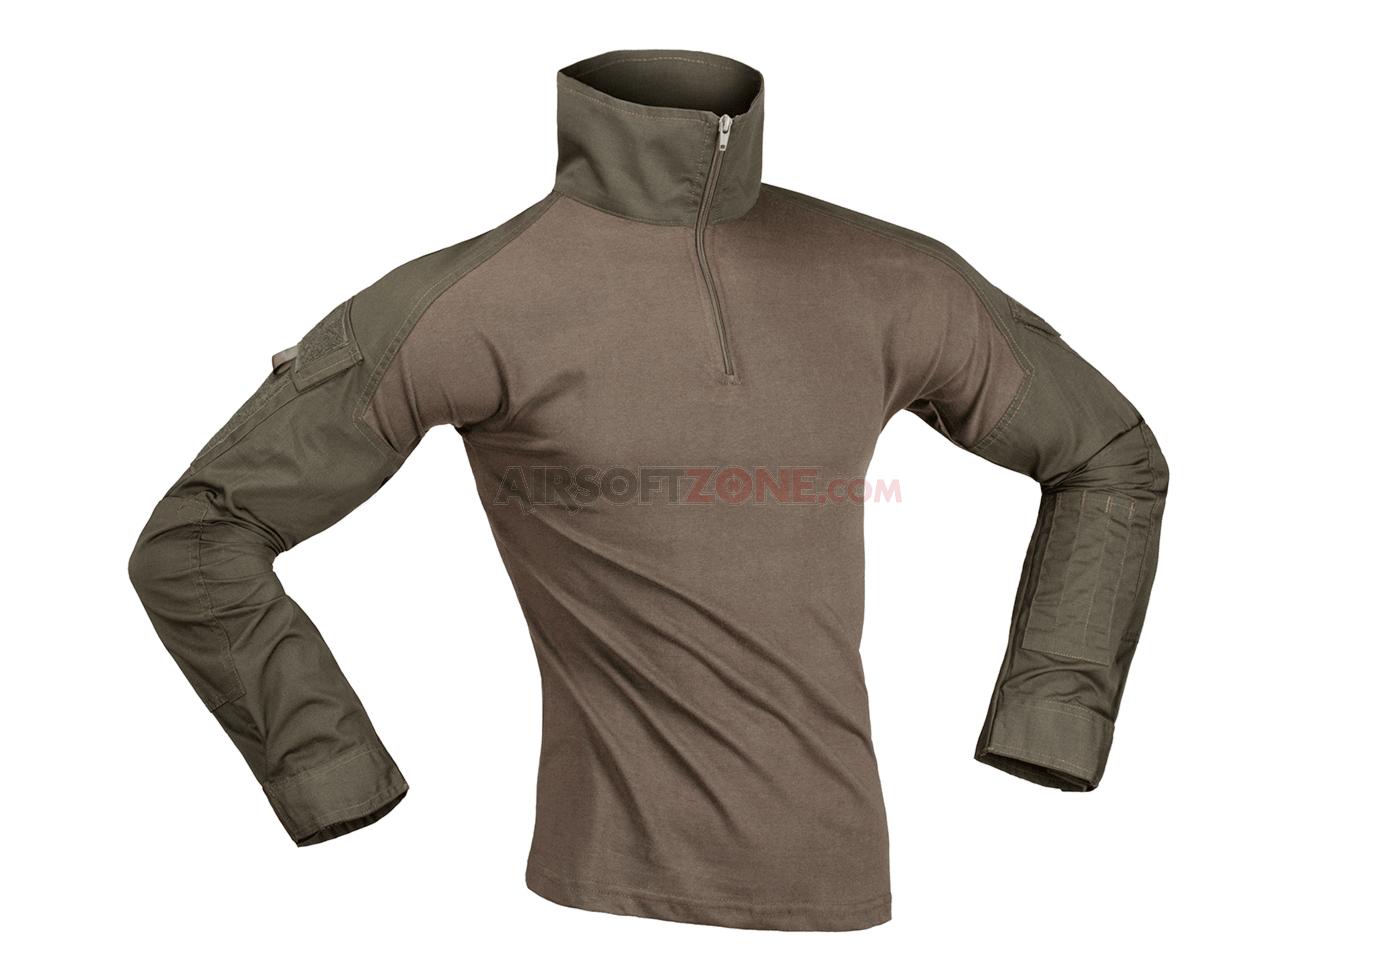 Combat Garments Shirt Shirts GearM Odinvader uliwOkTPXZ